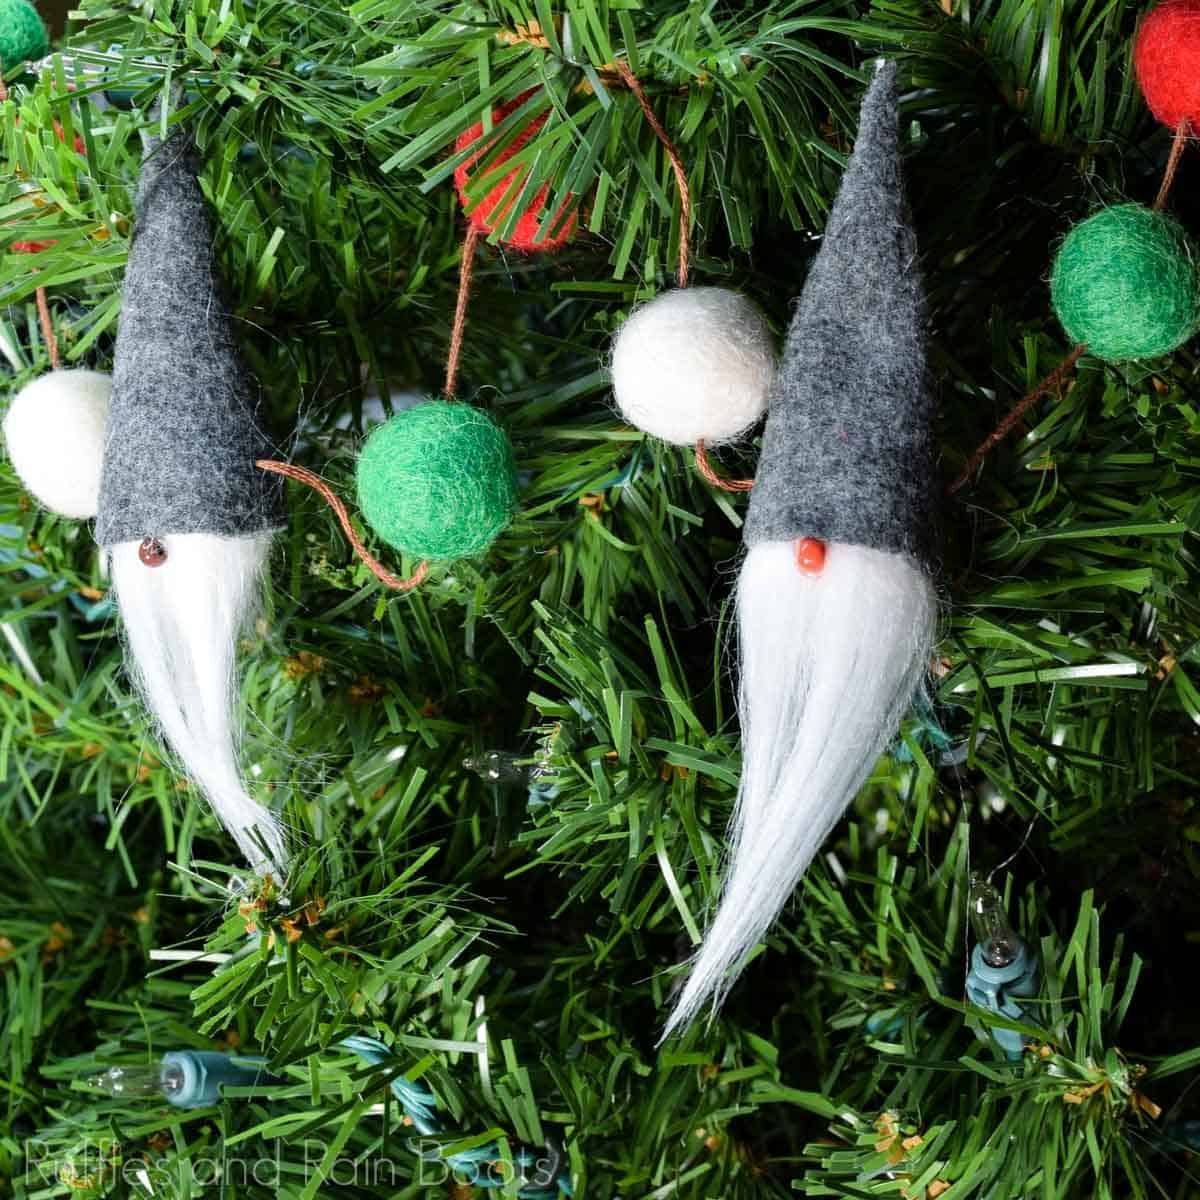 Make This Beautiful Gnome Garland in 15 Minutes! Diy